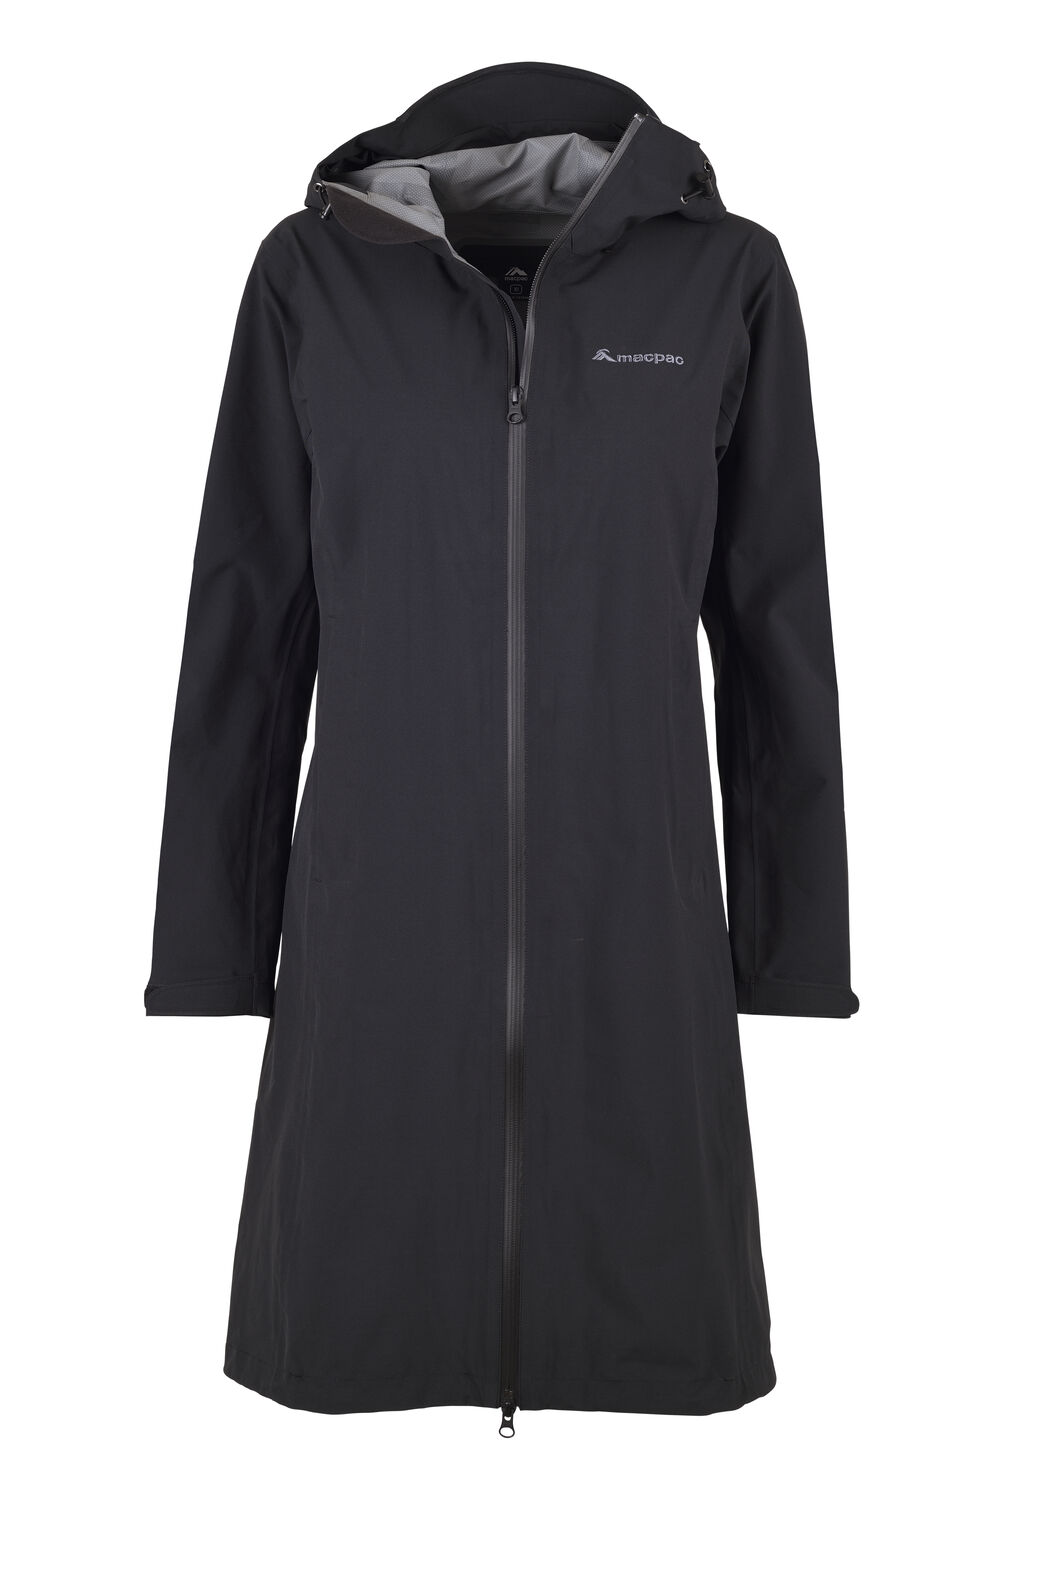 Macpac Dispatch Rain Coat — Women's, Black, hi-res